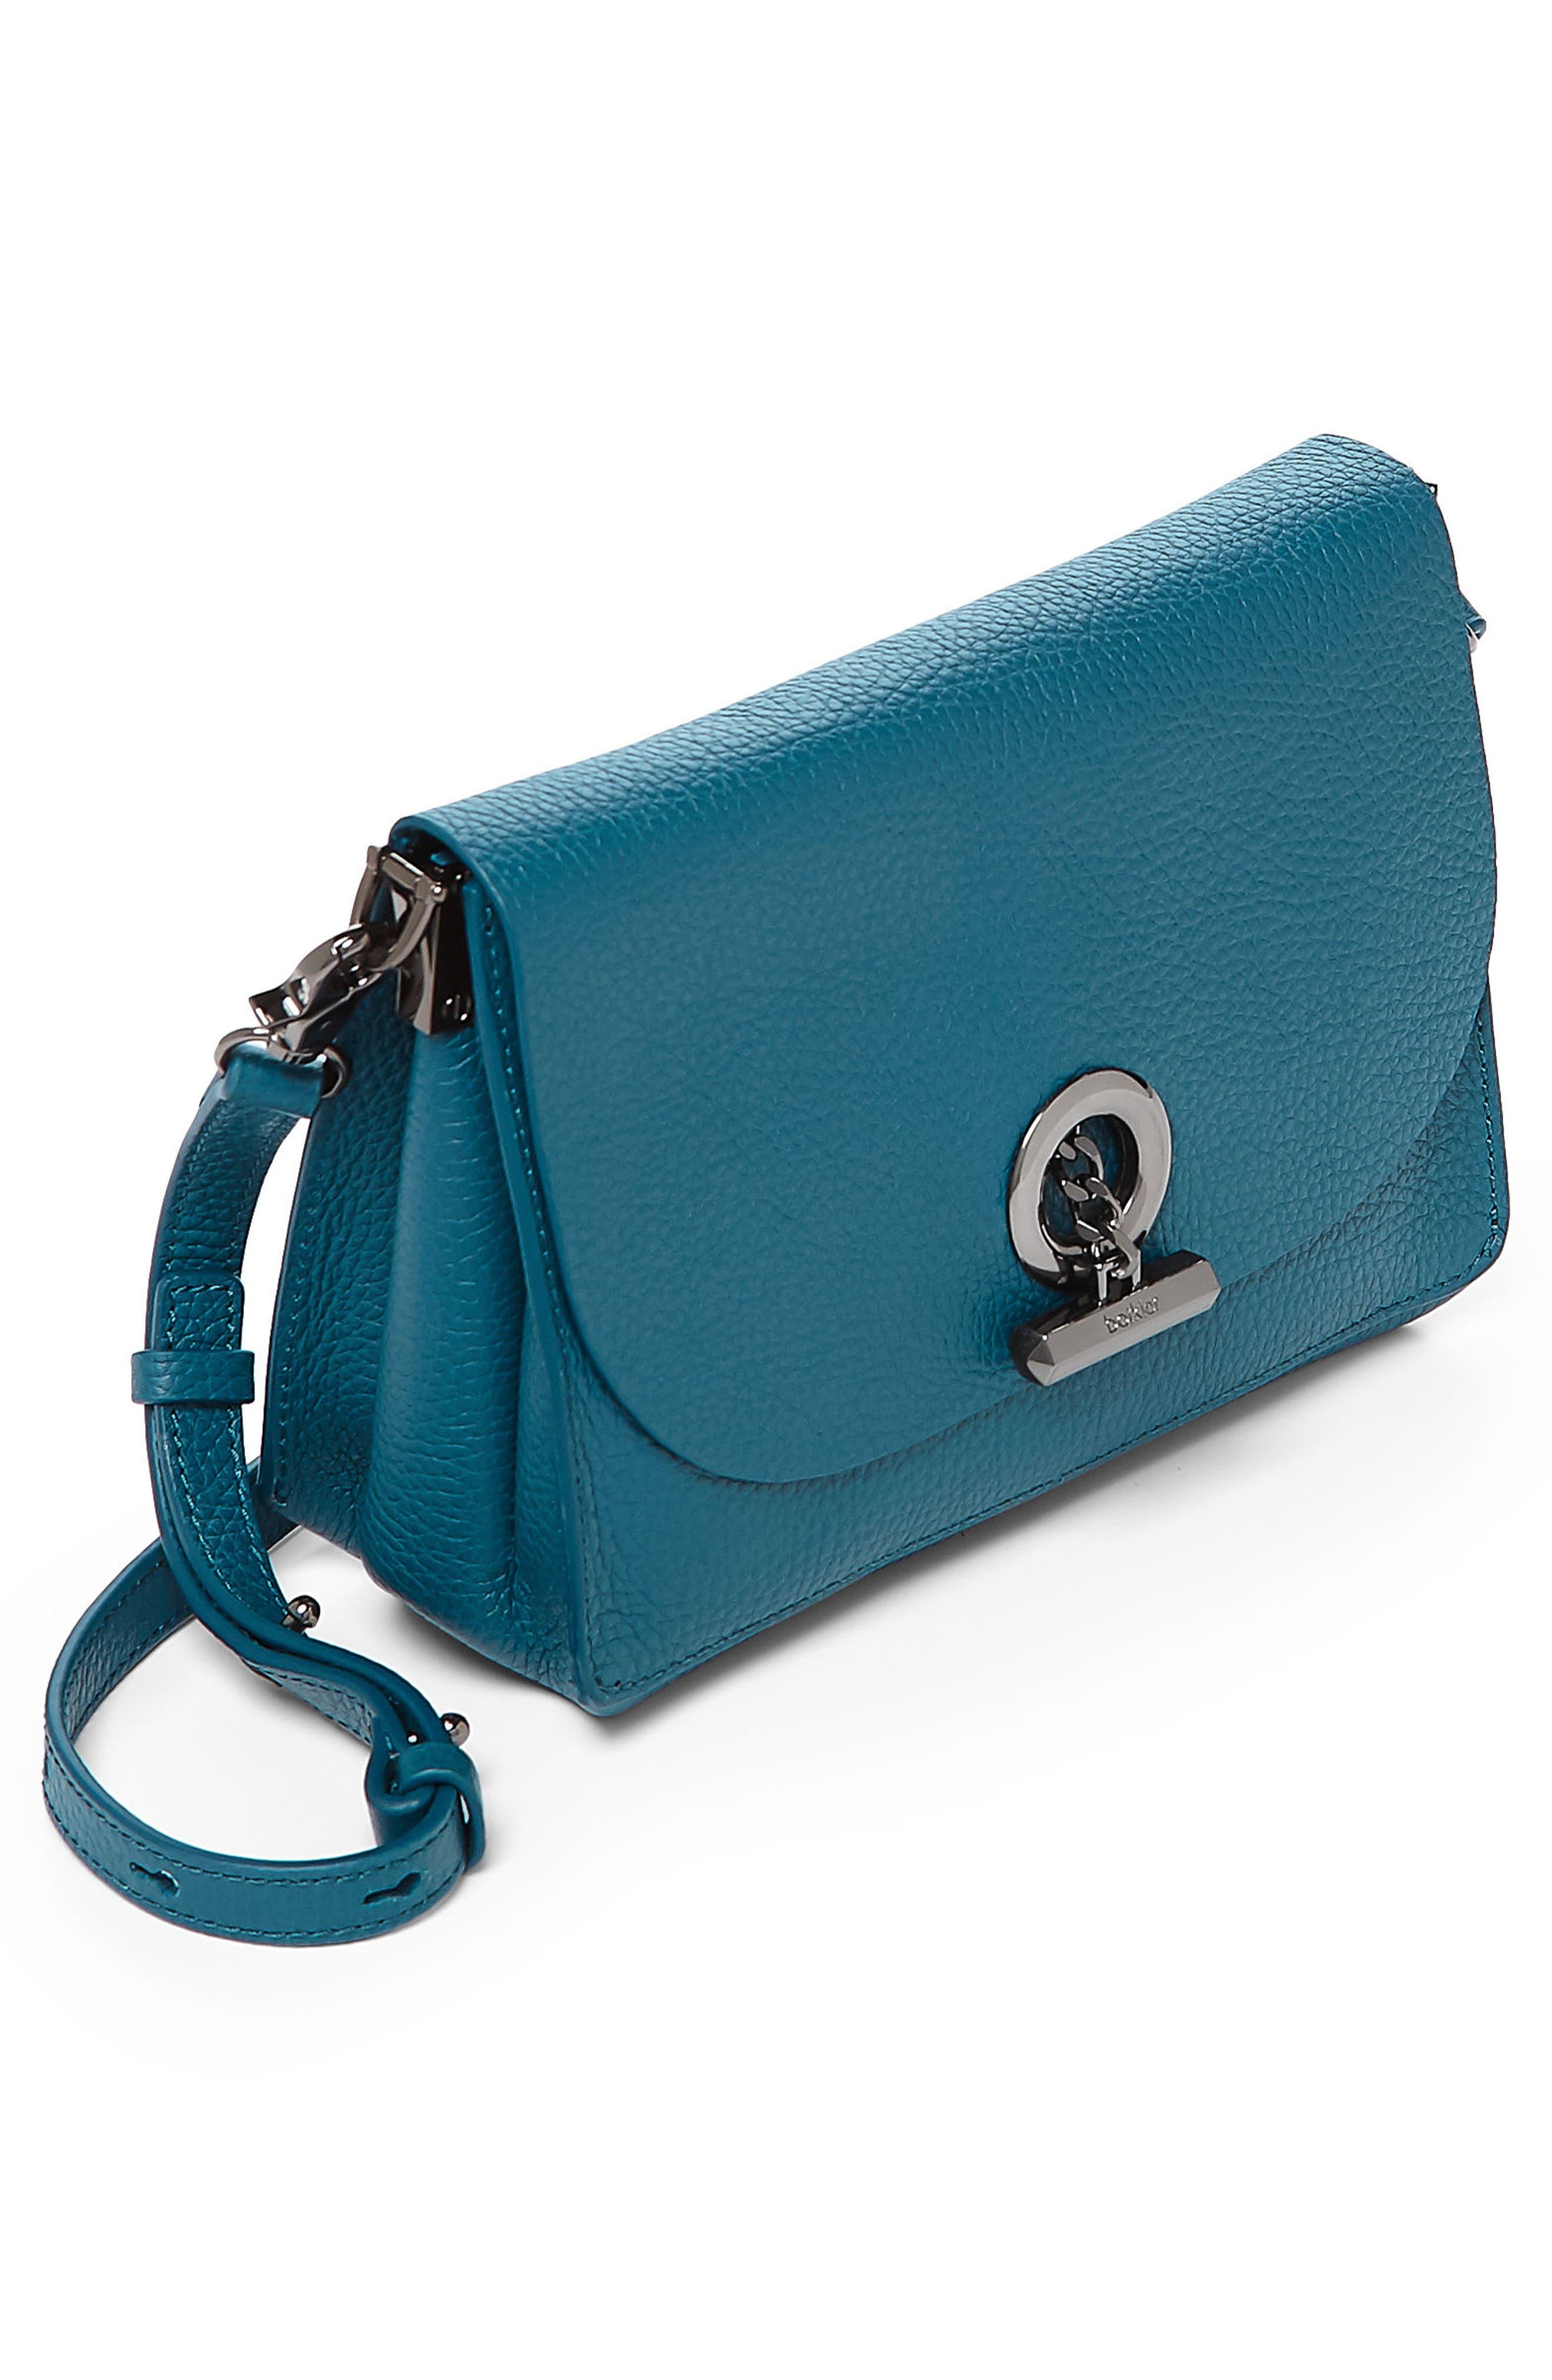 Waverly Leather Crossbody Bag,                             Alternate thumbnail 23, color,